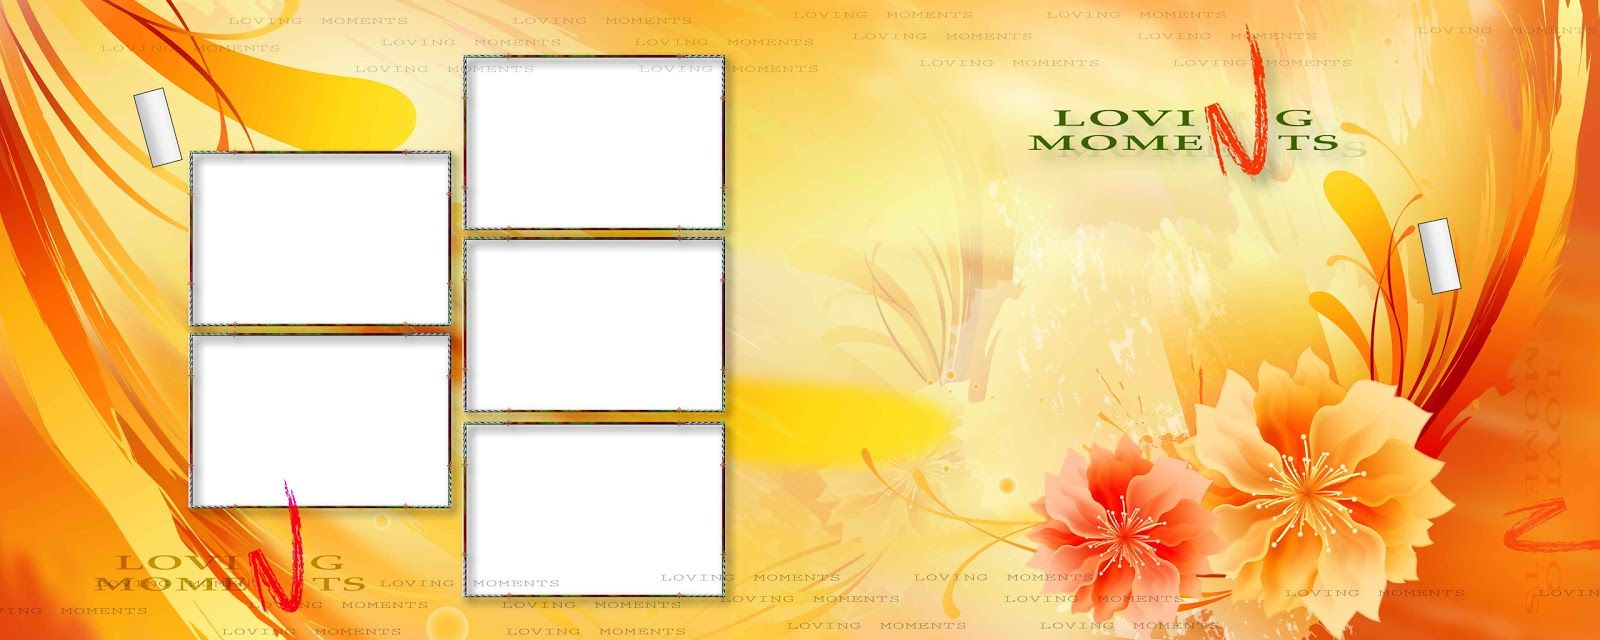 Karishma Wedding Album Design in Photoshop PSD | Album | Pinterest ...